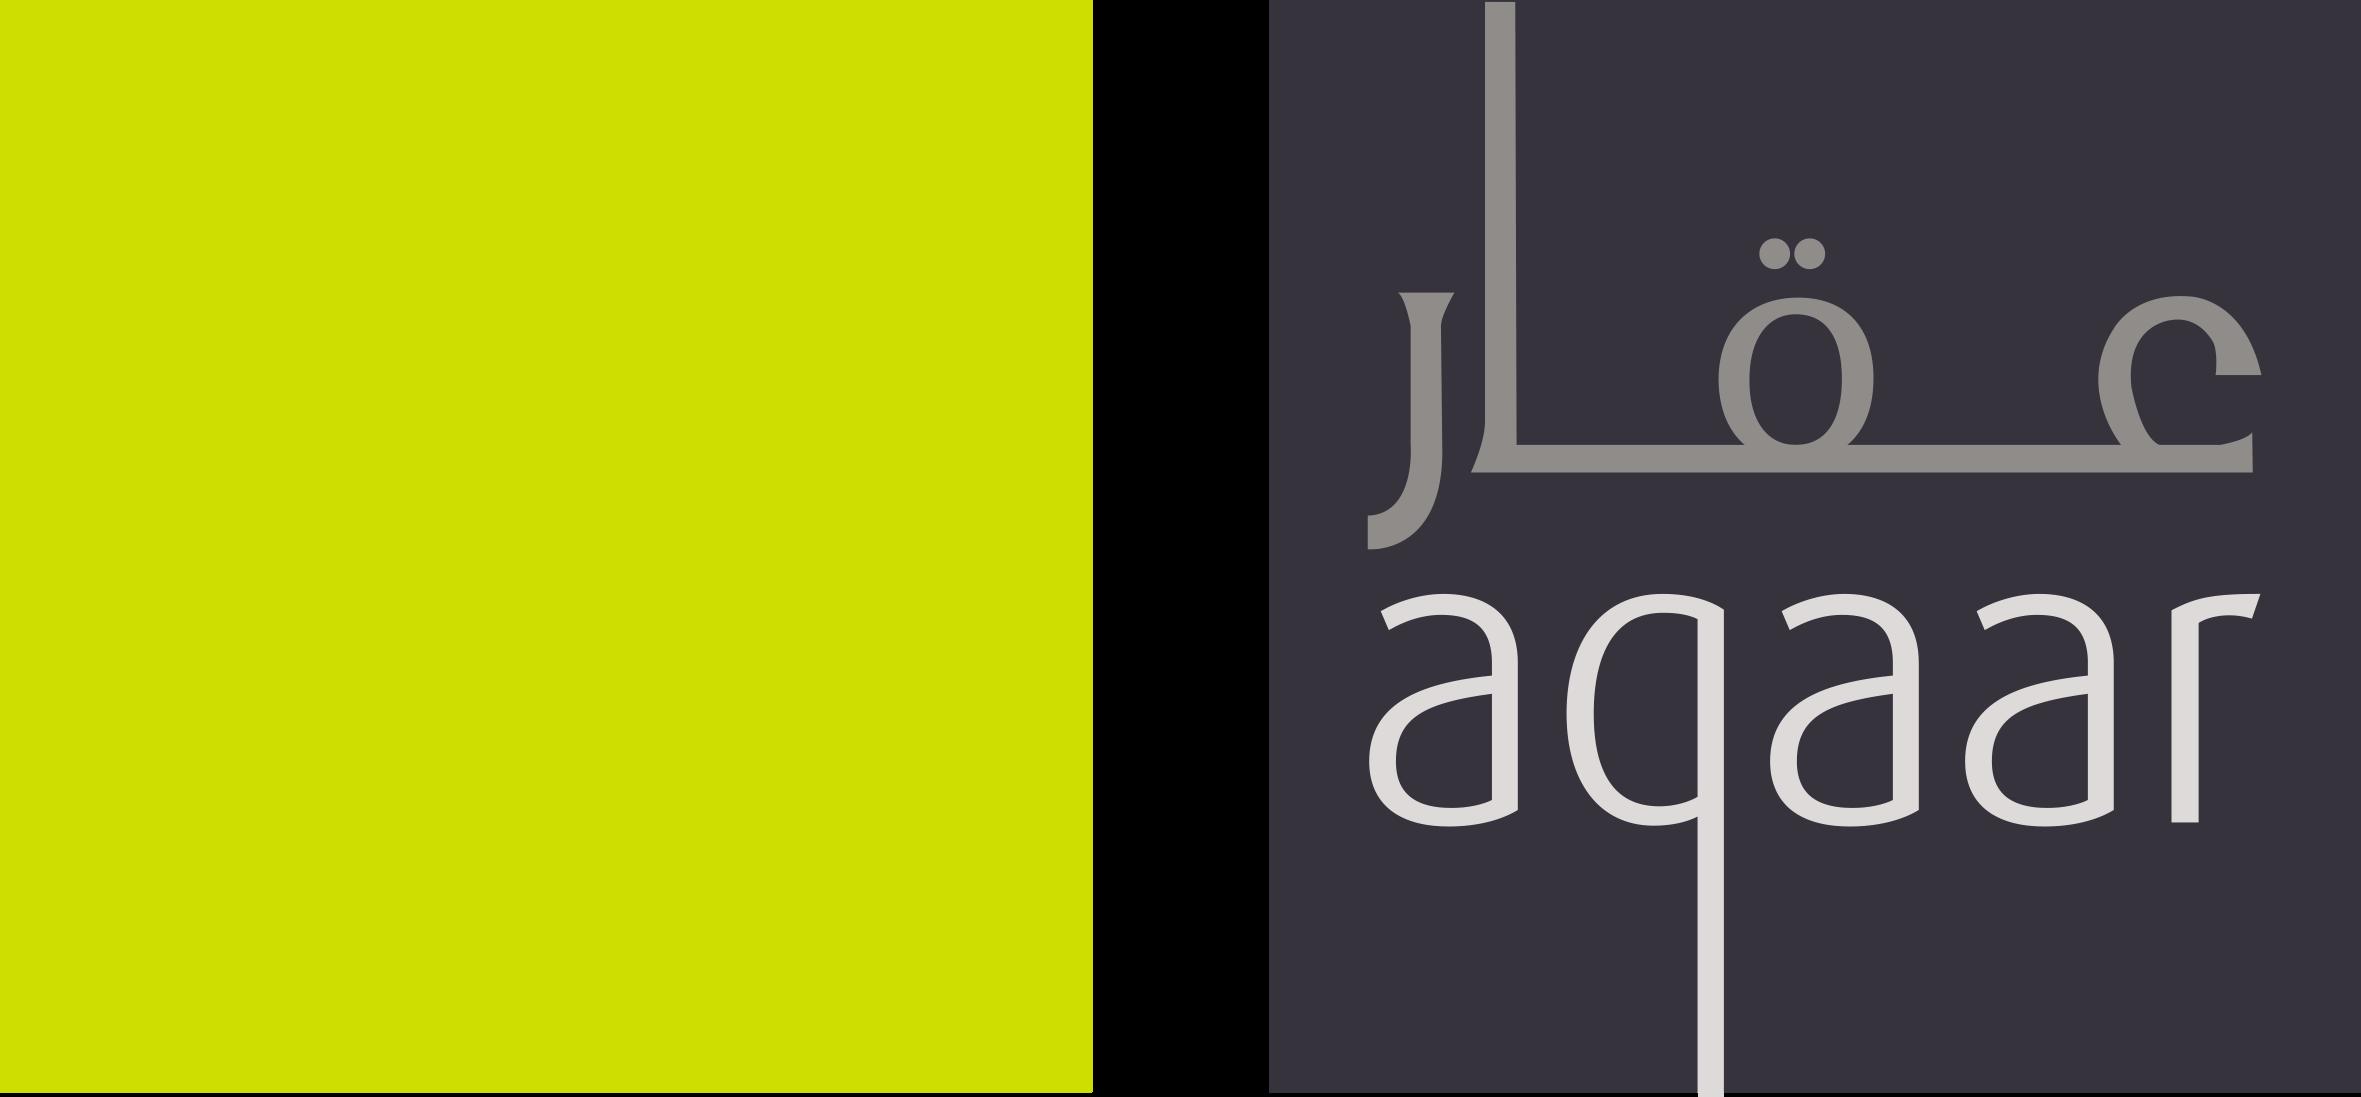 Aqaar Ajman Properties Corporation